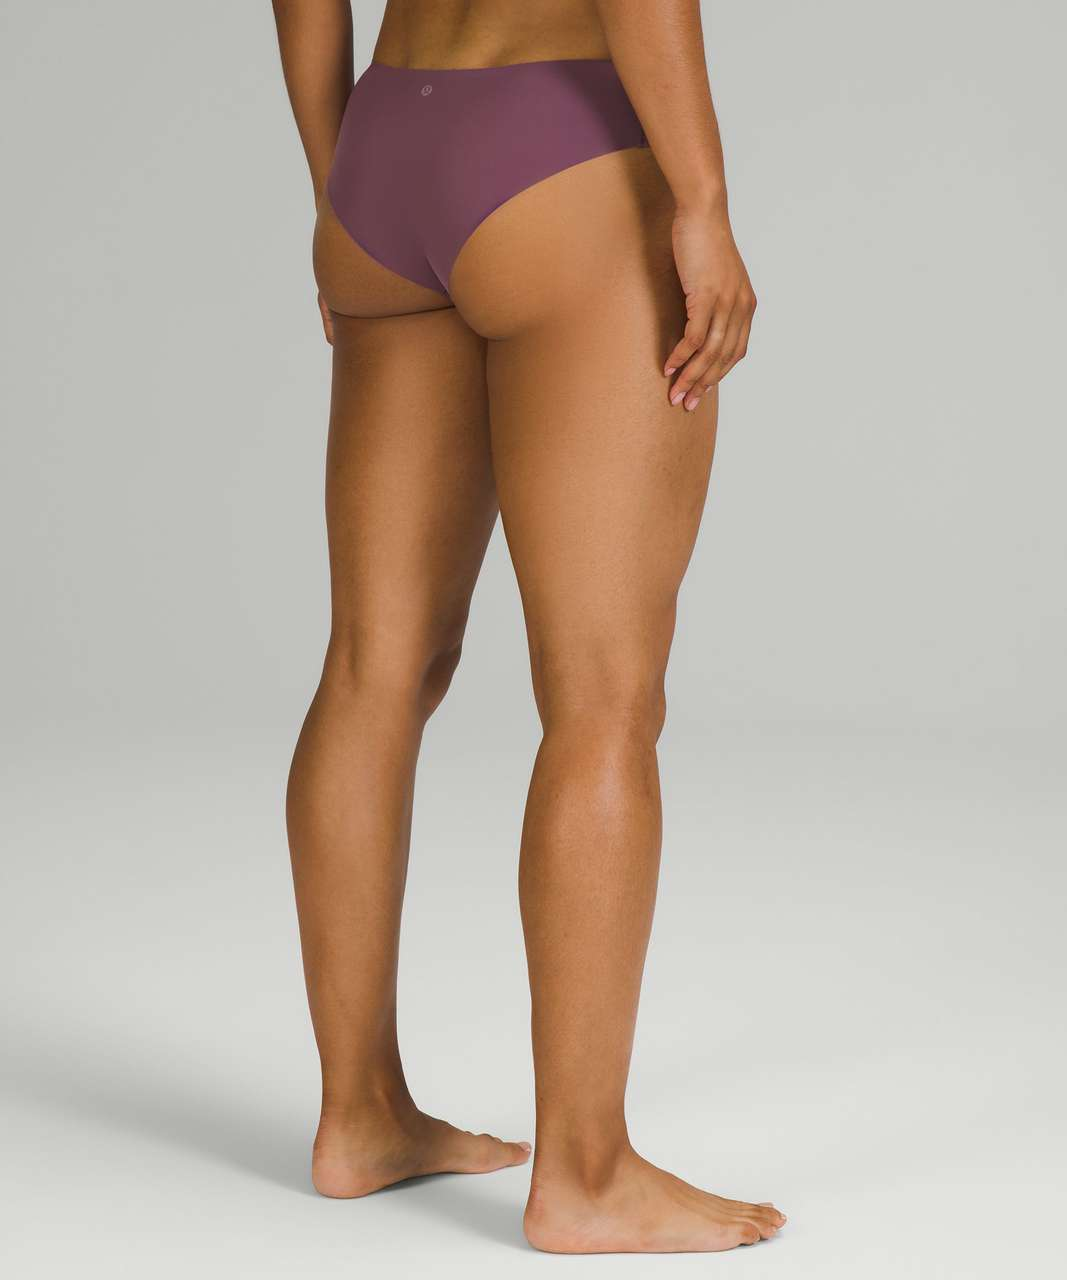 Lululemon InvisiWear Mid-Rise Cheeky Bikini Underwear 3 Pack - Chrome / Brick Purple / Dew Green